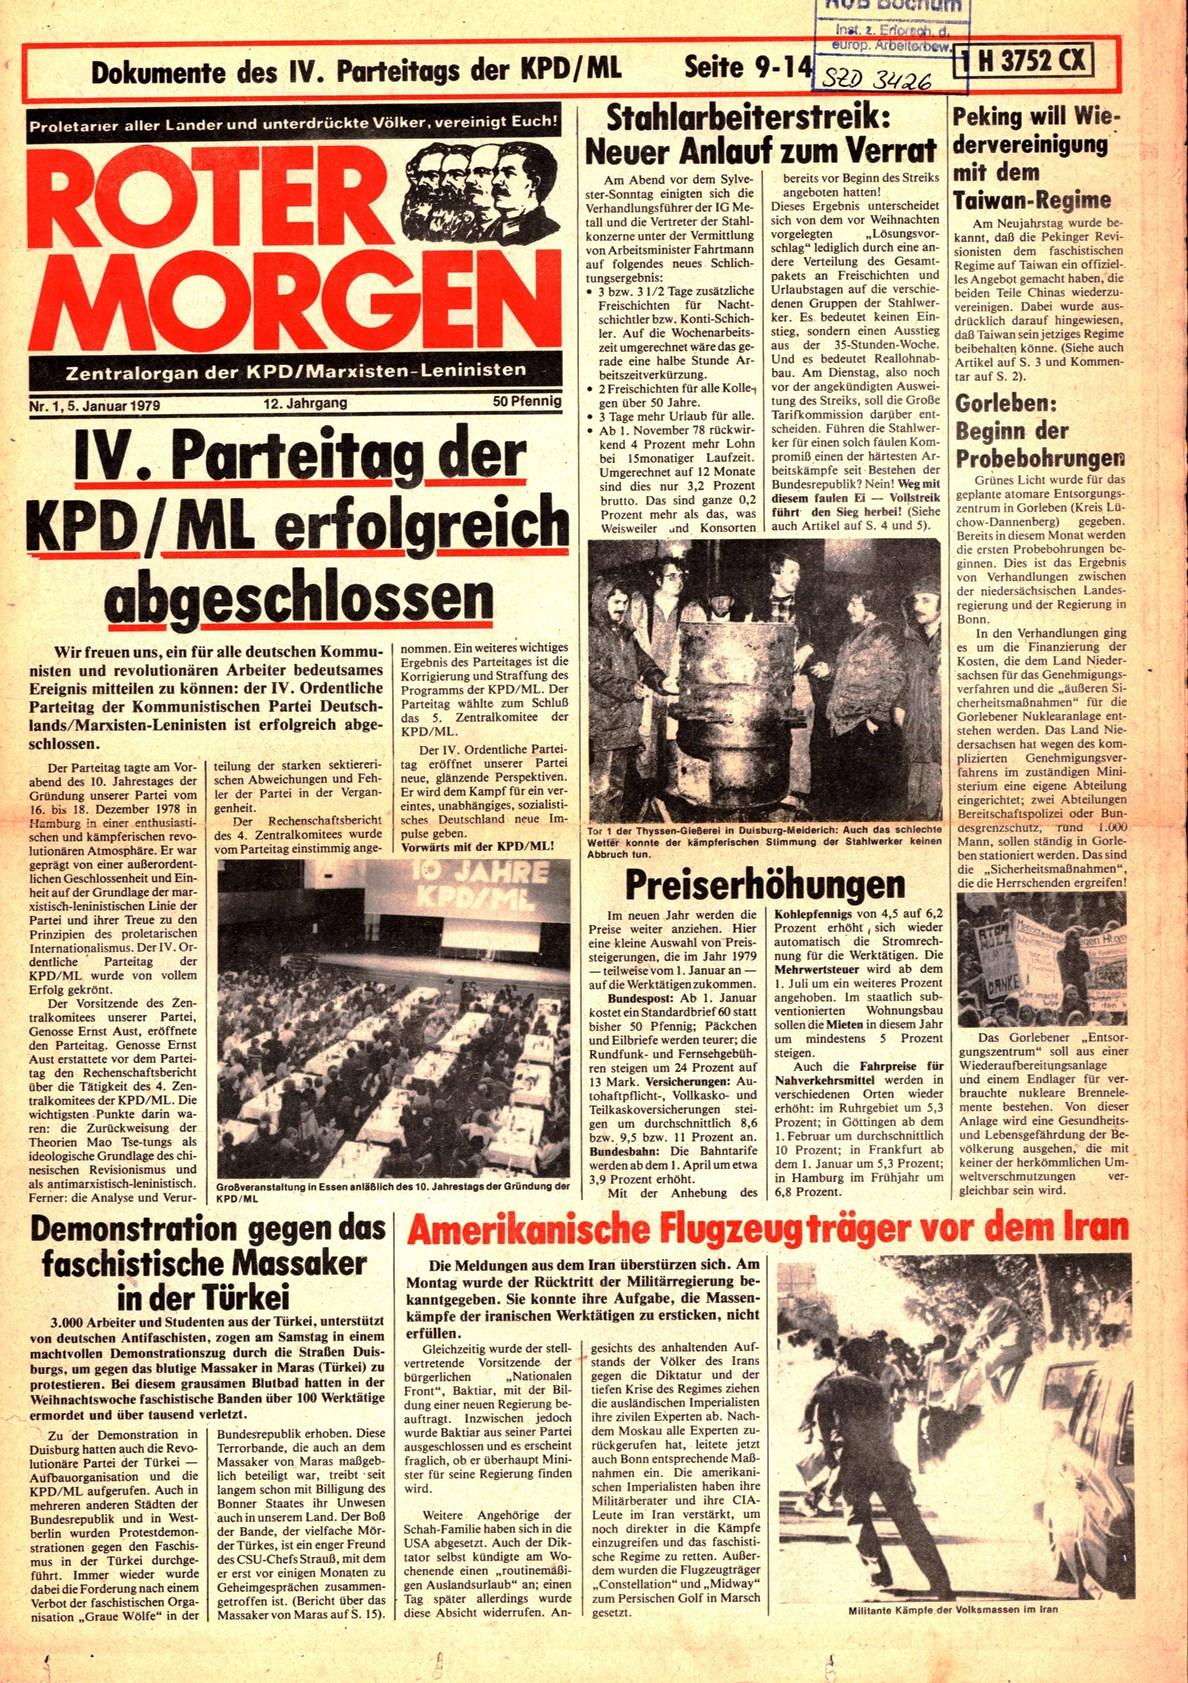 Roter Morgen, 13. Jg., 5. Januar 1979, Nr. 1, Seite 1